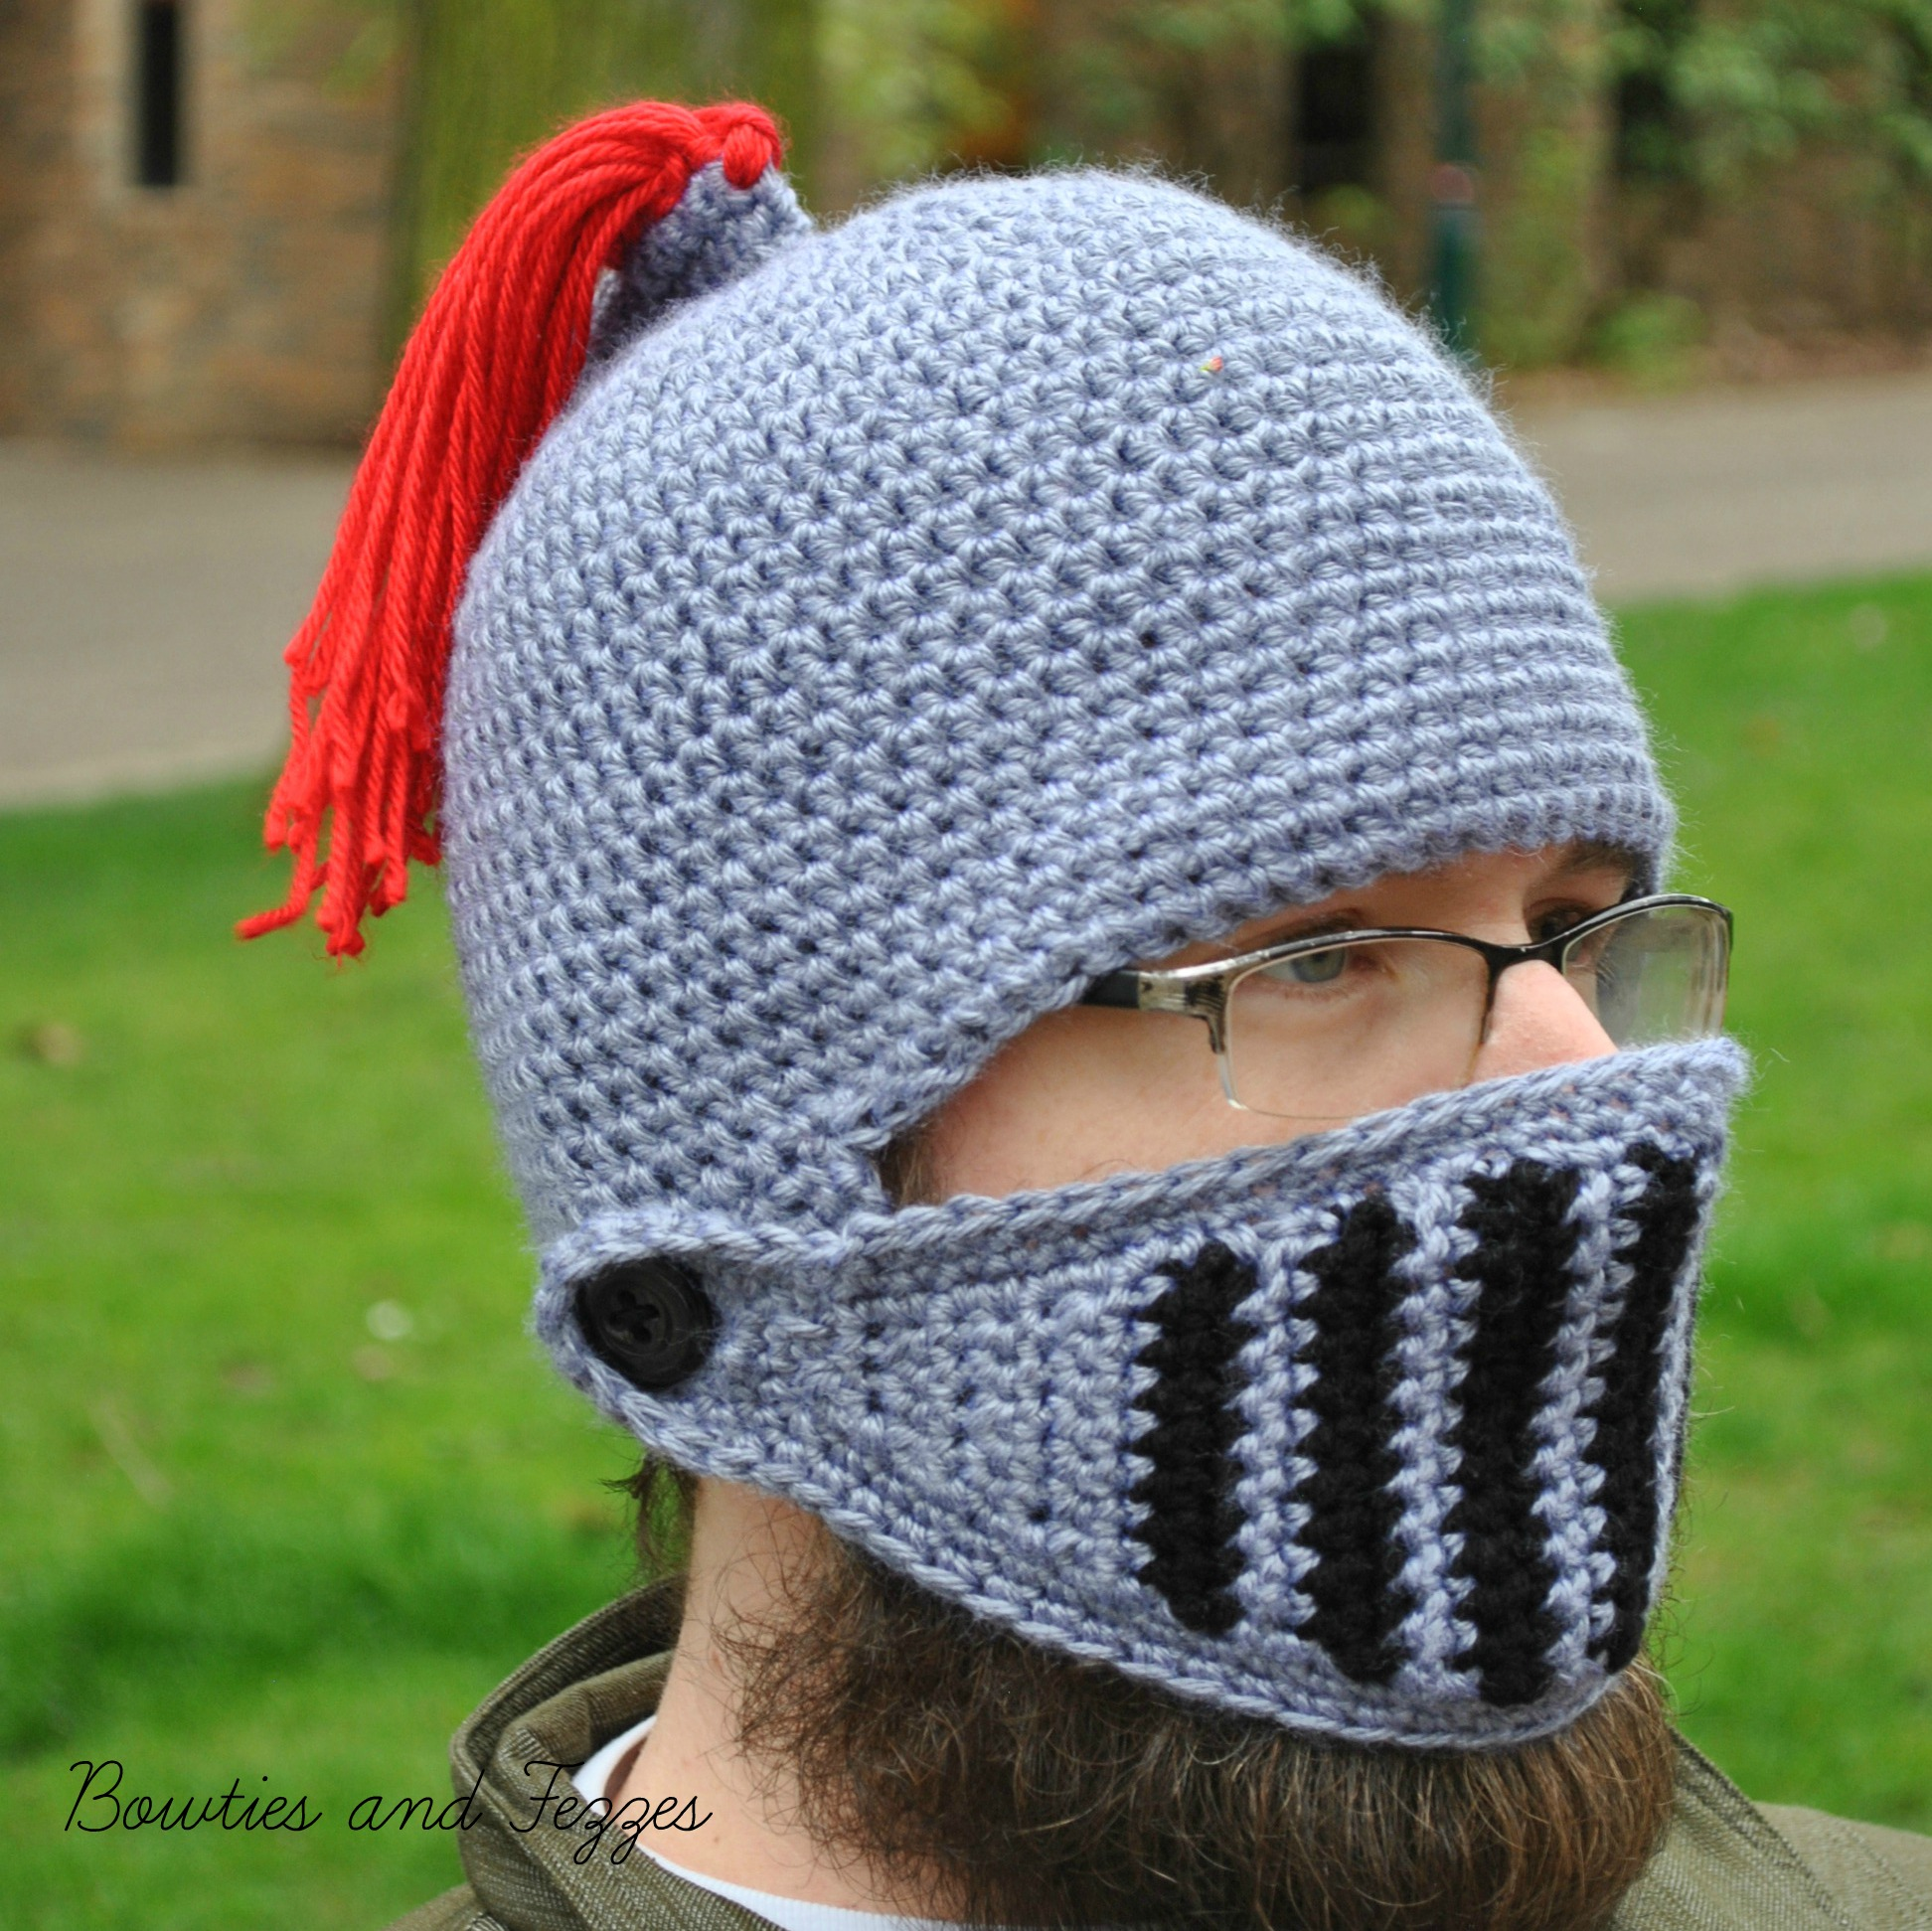 Sir Knight Helmet Crochet Pattern Free American Bathtub Refinishers